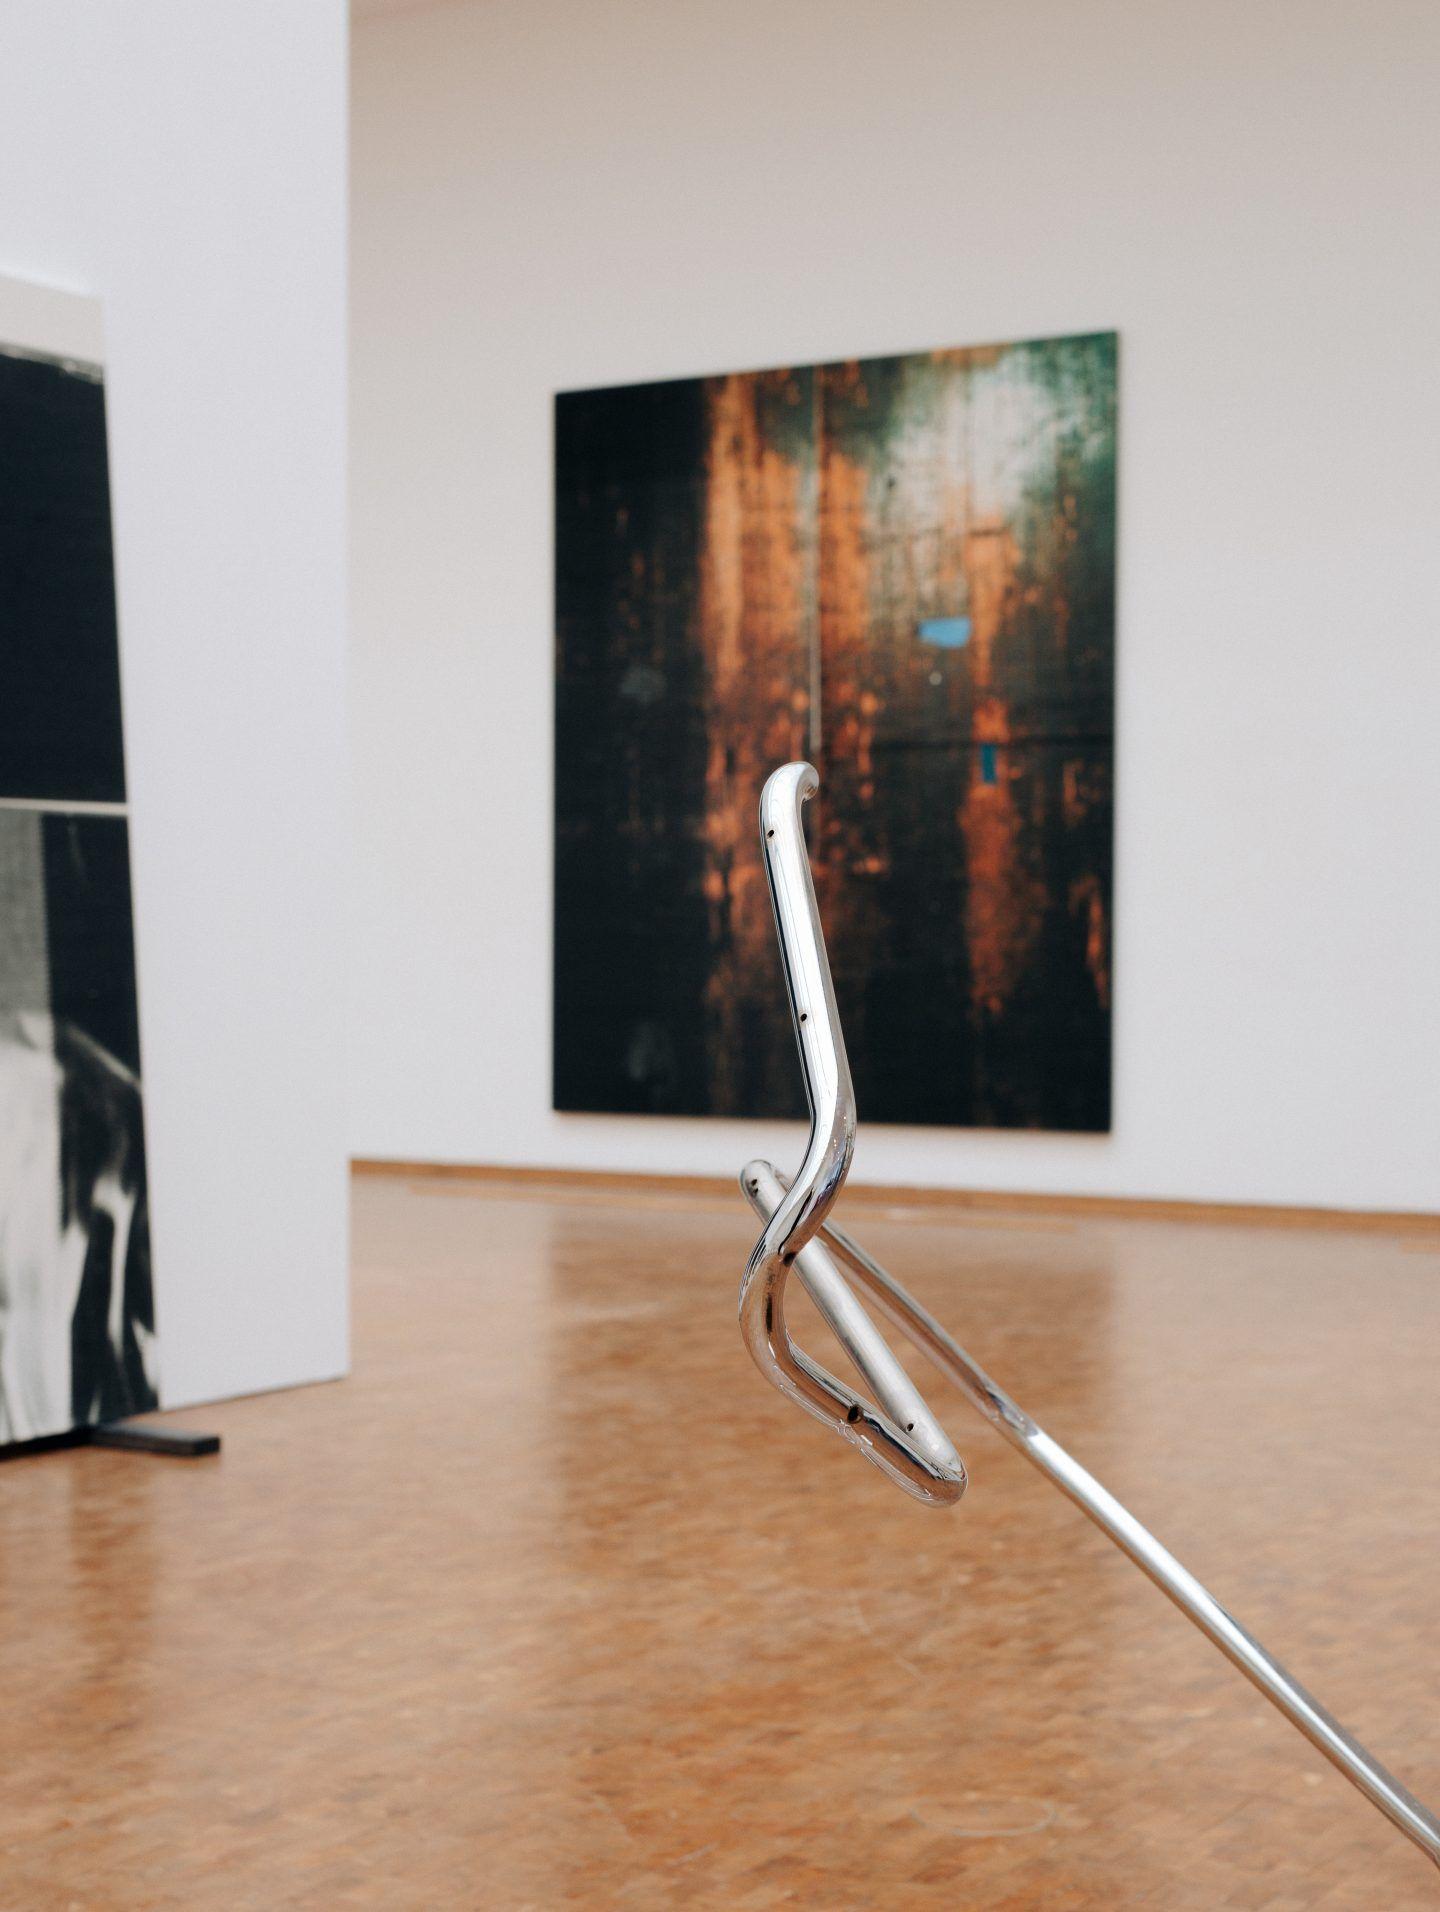 ignant-design-thomas-pirot-wade-guyton-museum-ludwig-17